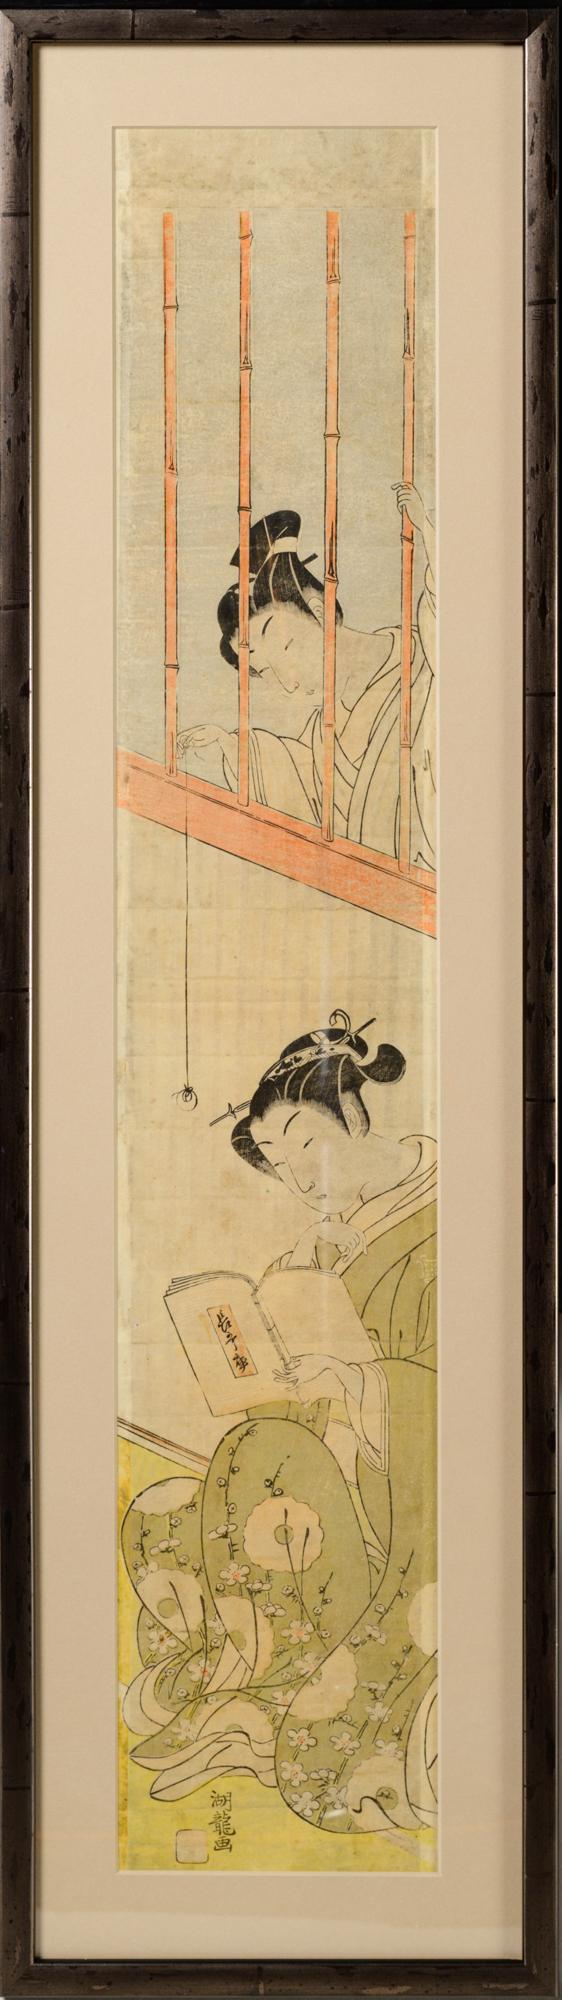 Japanese art, Japanese antique, Japanese print